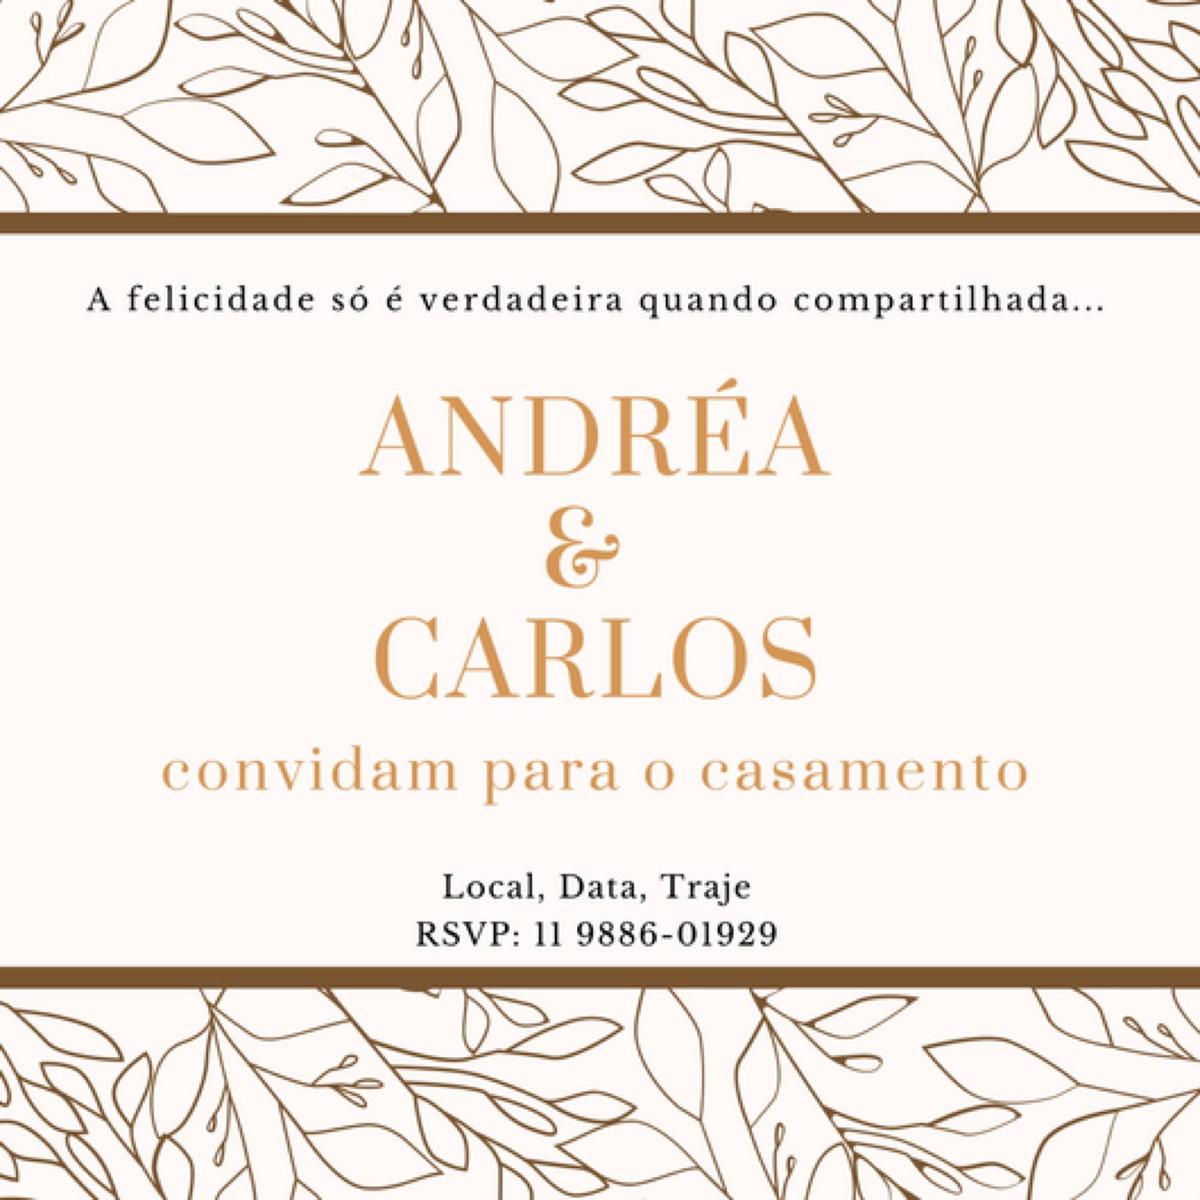 Convite Virtual Casamento No Elo7 Rosa Amarela Ateliê A34afb